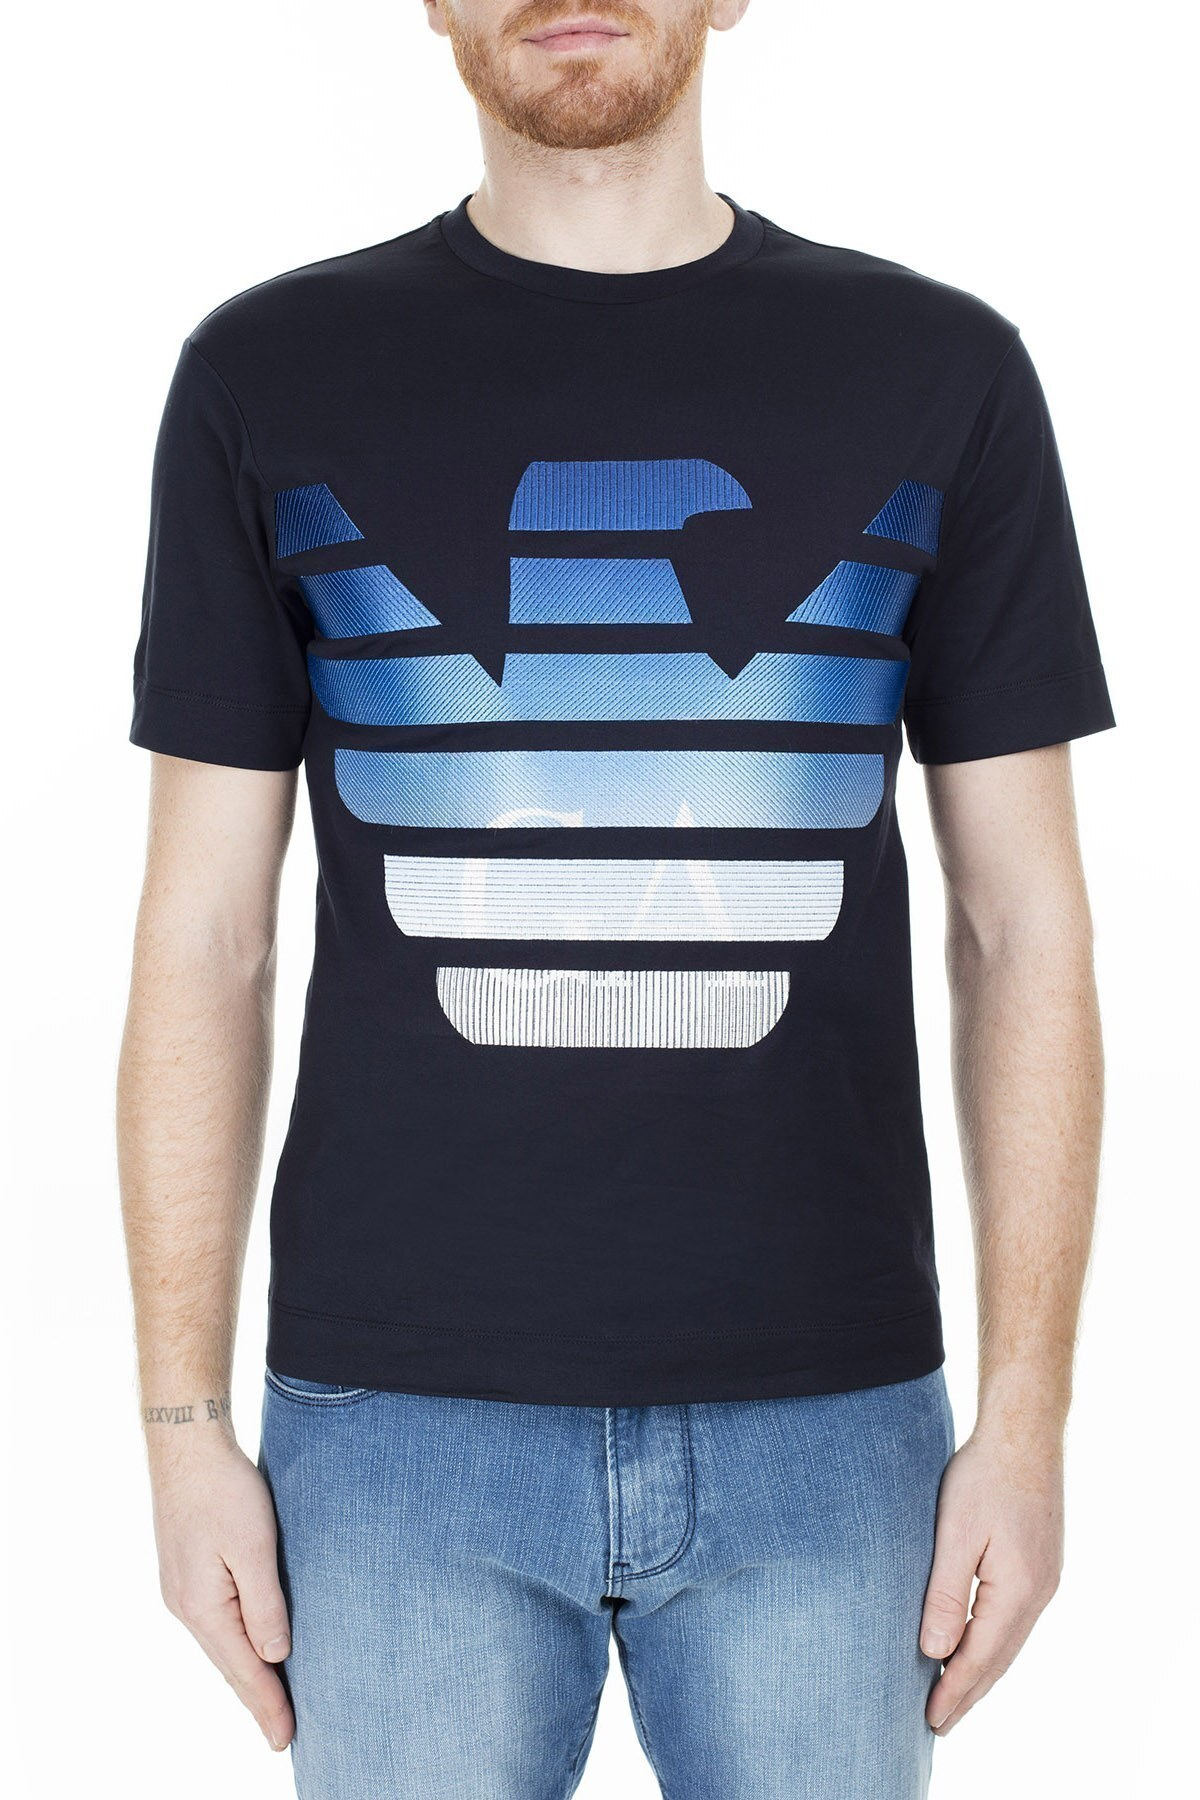 Emporio Armani Erkek T Shirt 3H1TN6 1JCQZ F989 LACİVERT